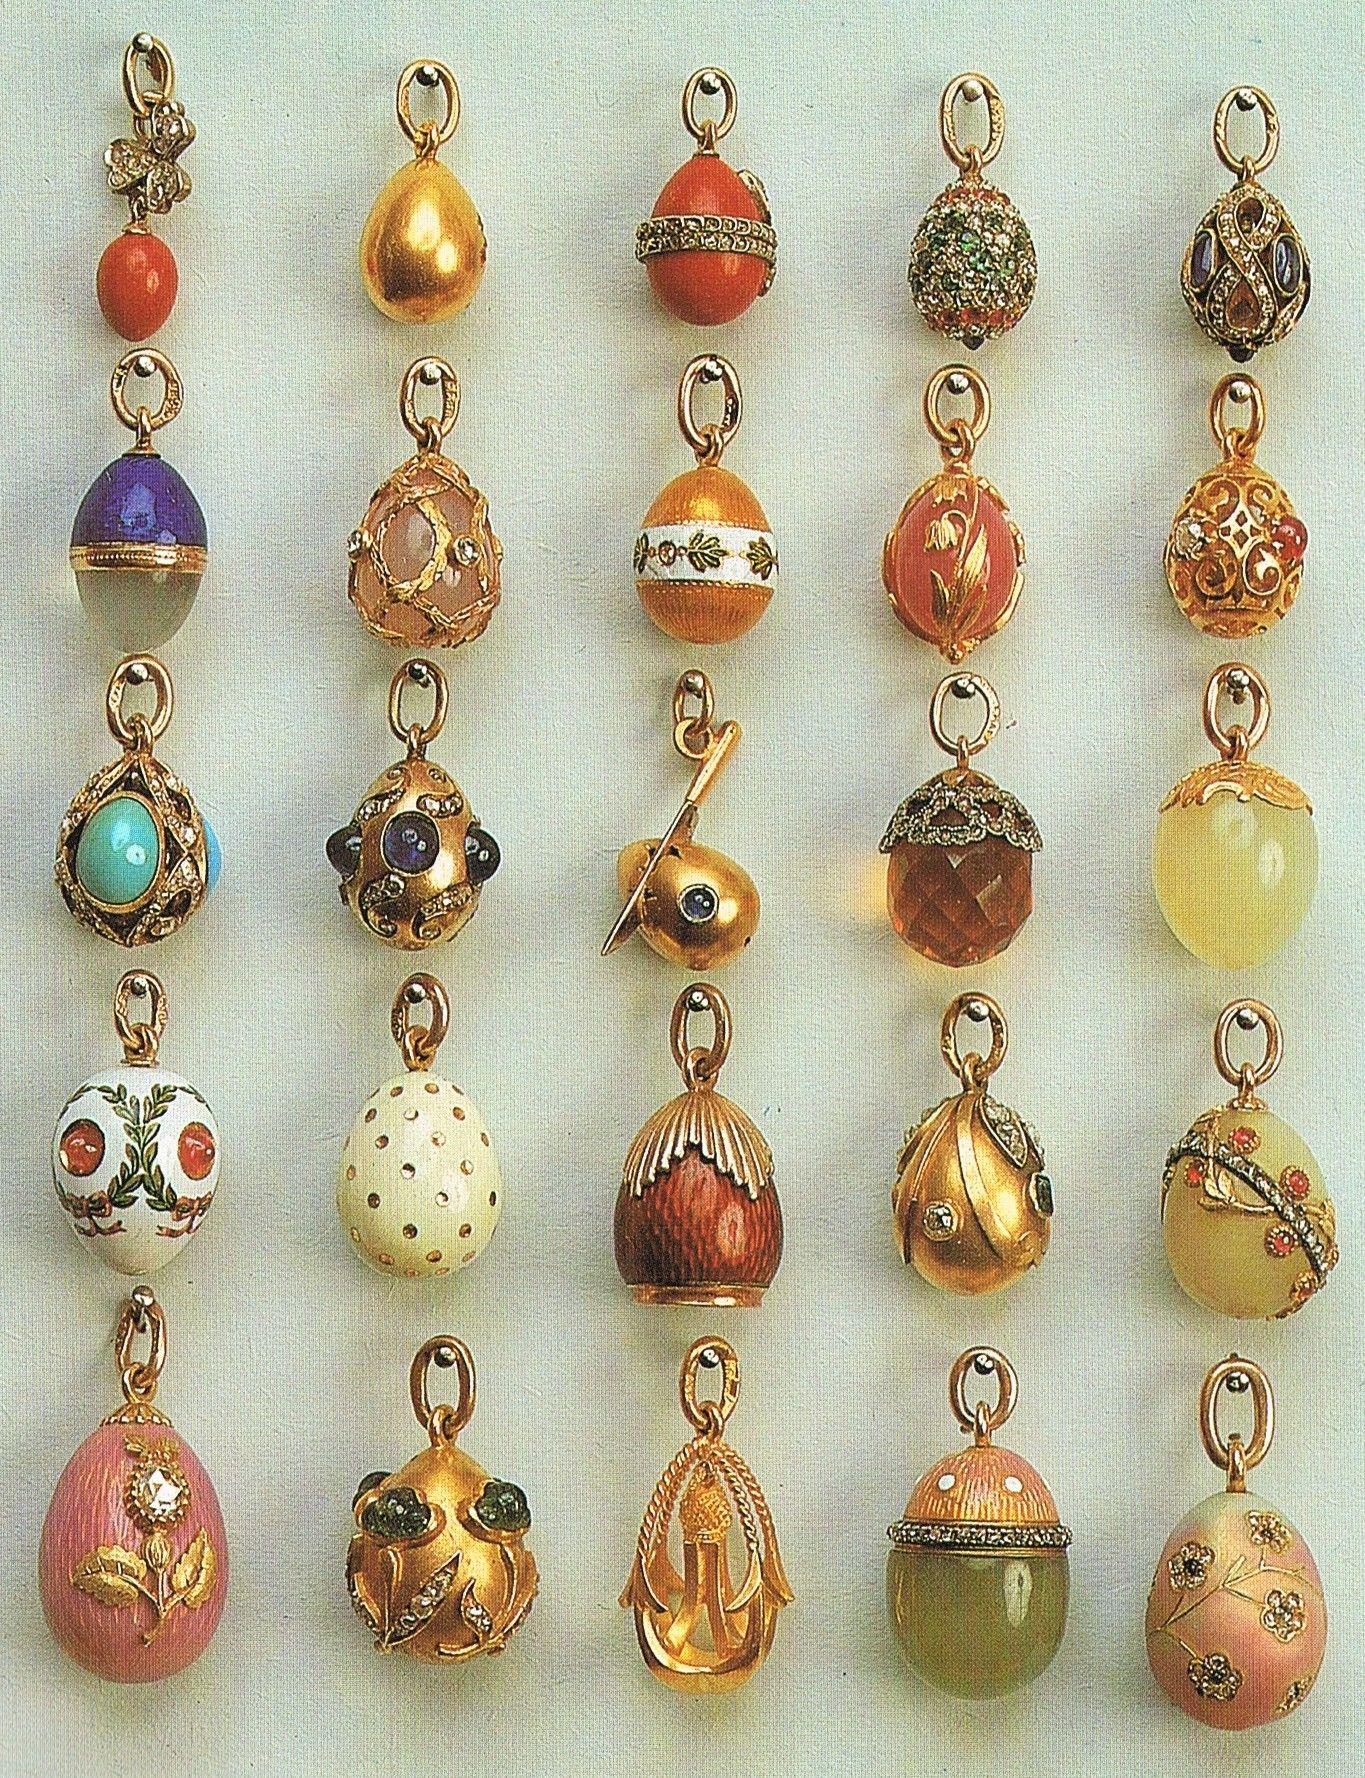 Faberge egg pendants 1899 1908 httphistory illustrated faberge egg pendants 1899 1908 httphistory illustrated aloadofball Gallery